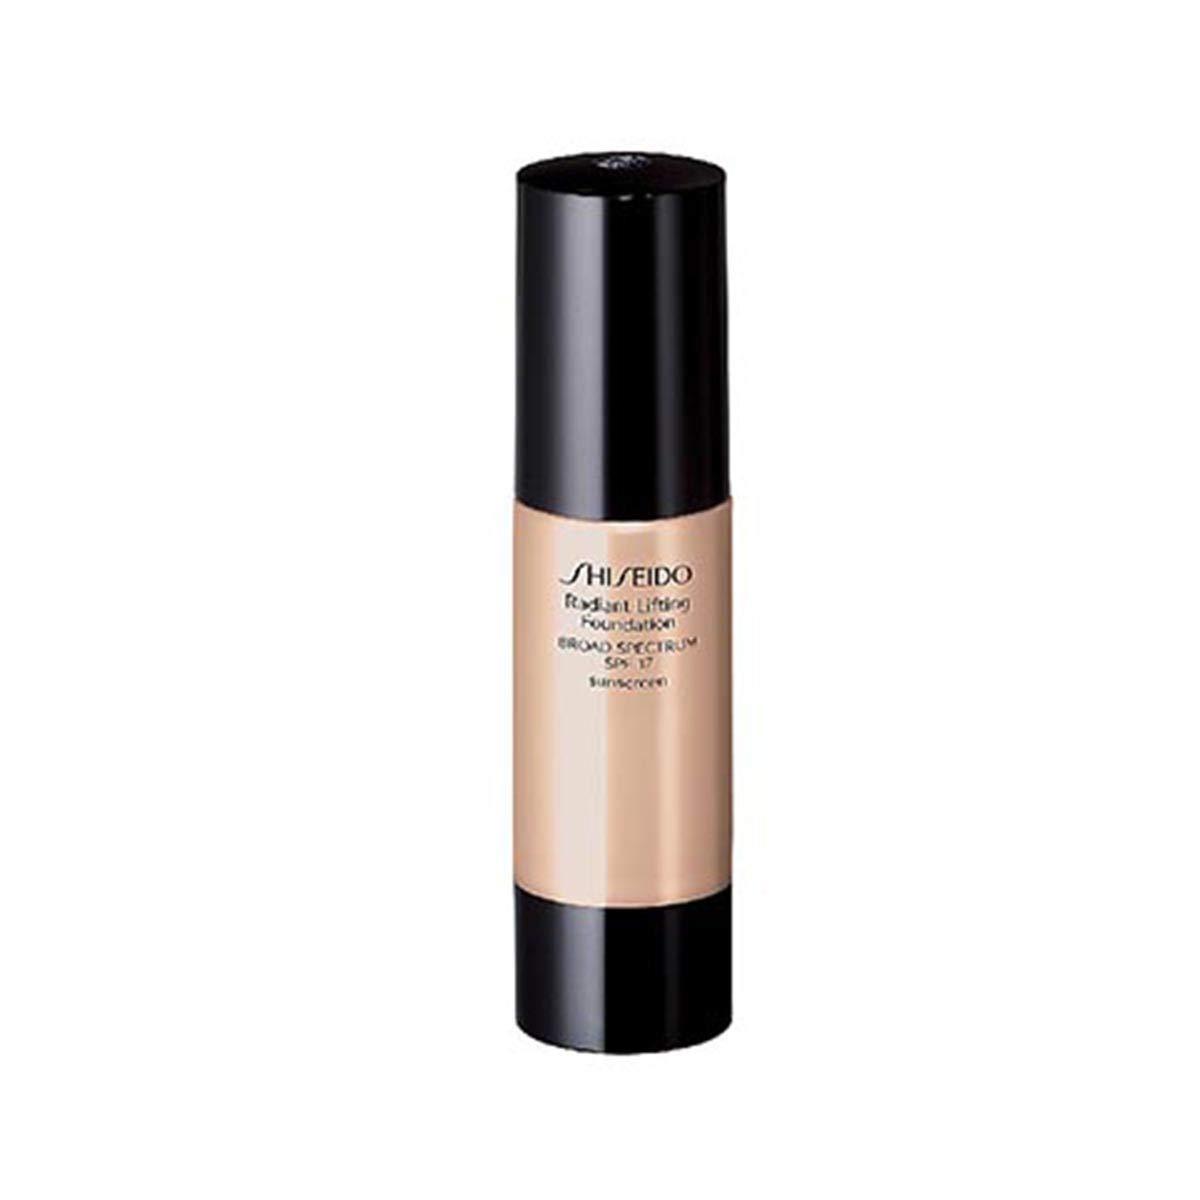 Shiseido Radiant Lifting Foundation SPF 15 - # B60 Natural Deep Beige 30ml/1.2oz